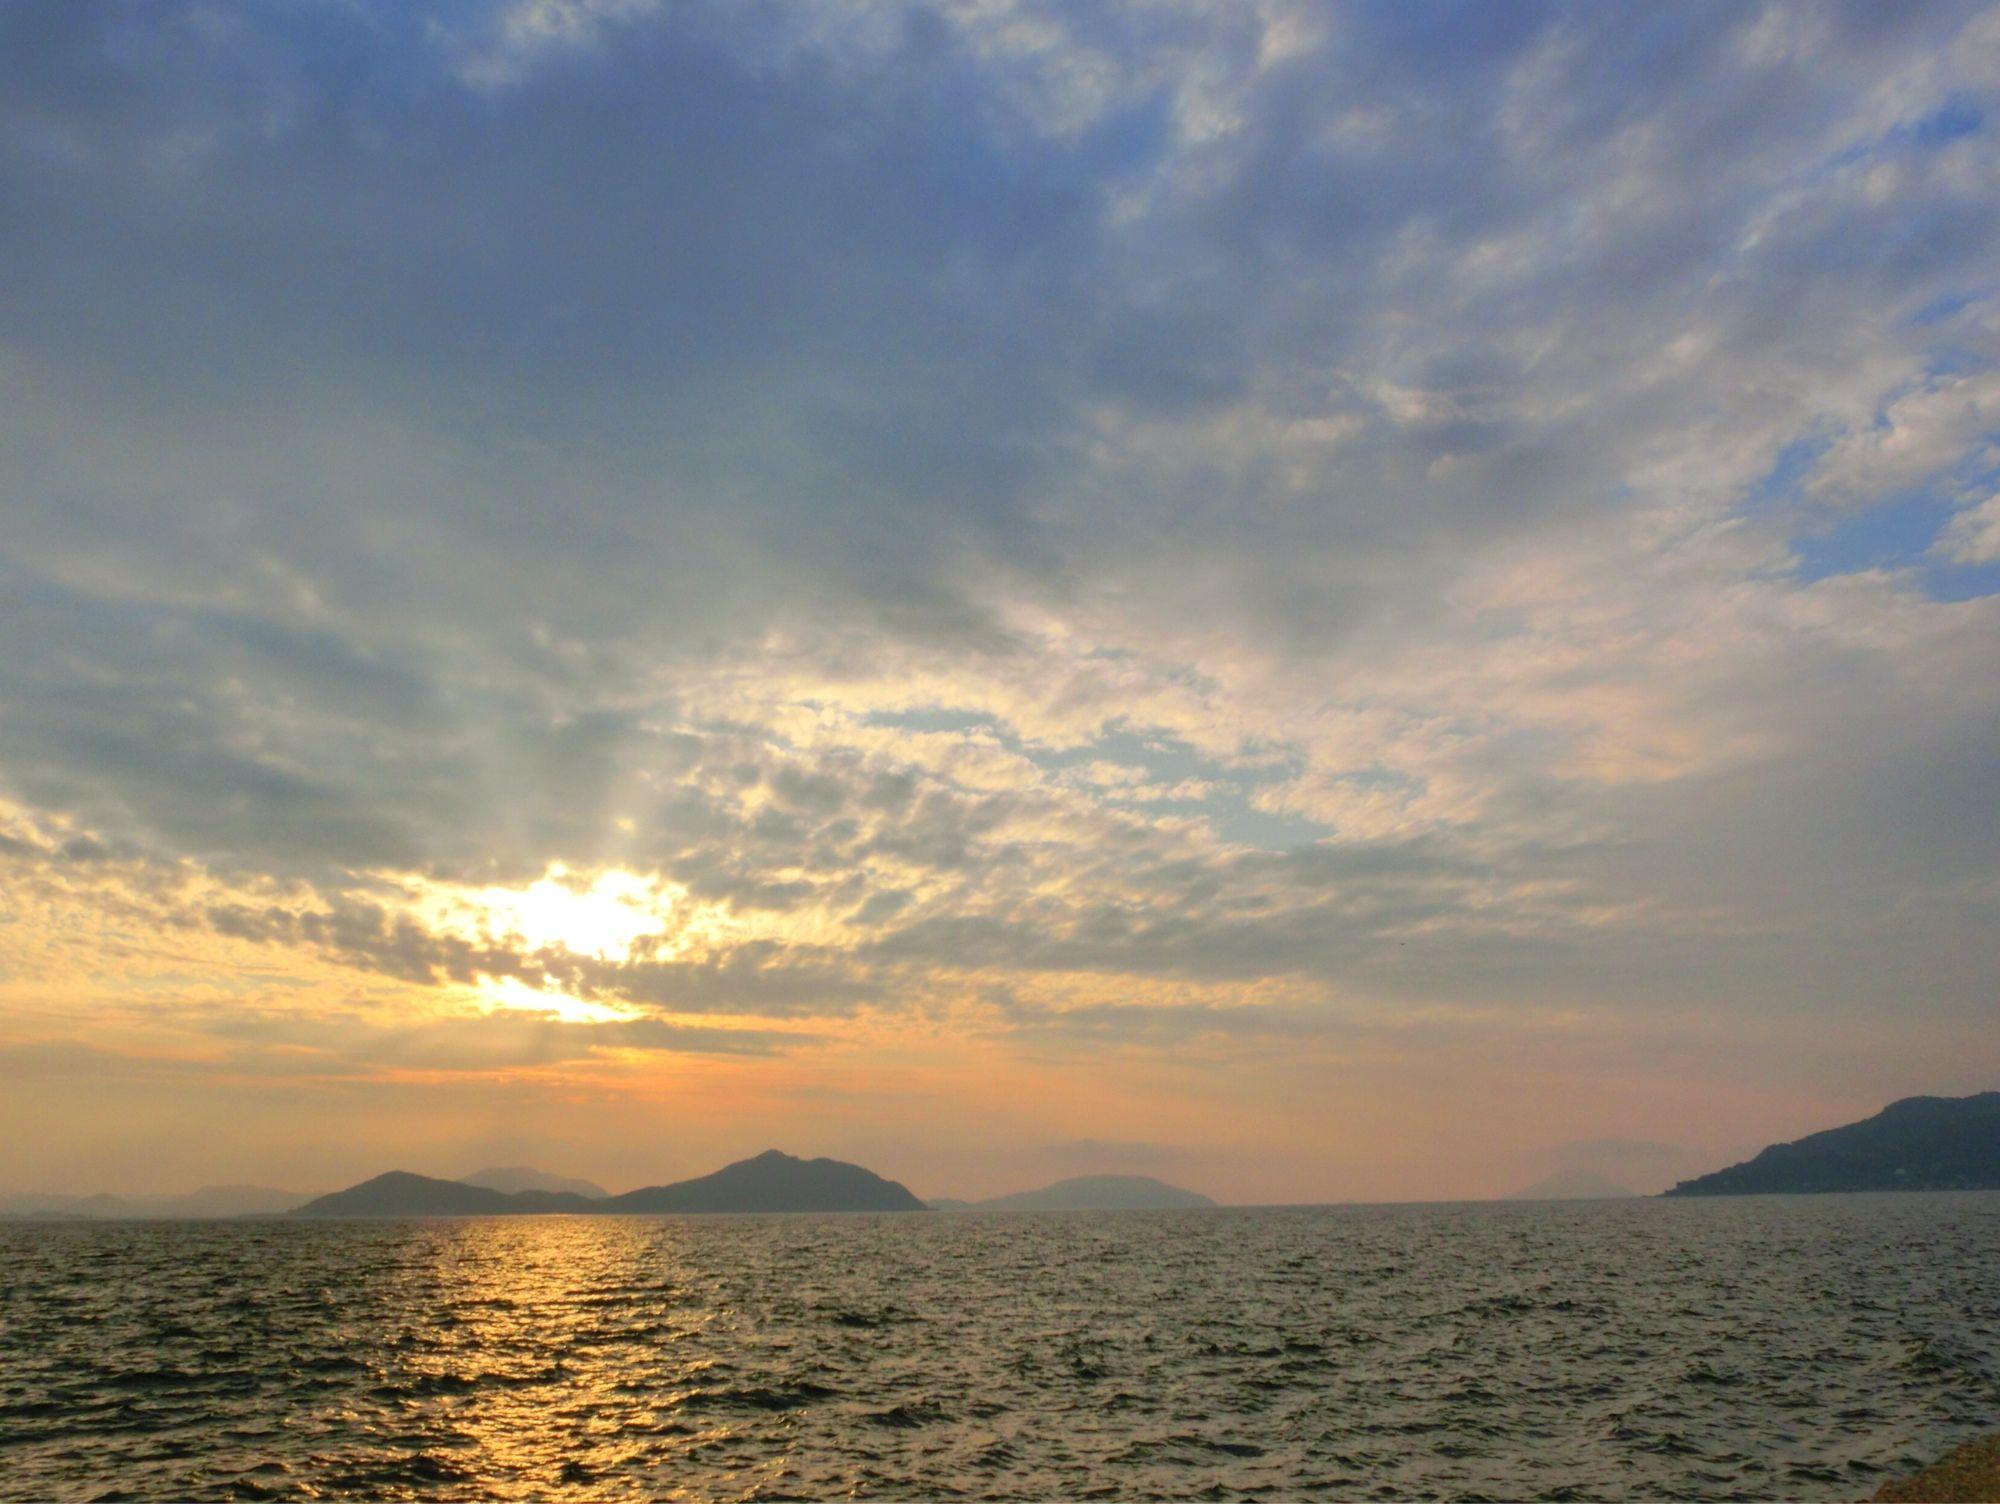 ( Evening Now at Hakata bay in Japan) 10 July 18:42 晴れ間が見えてきた博多湾です。